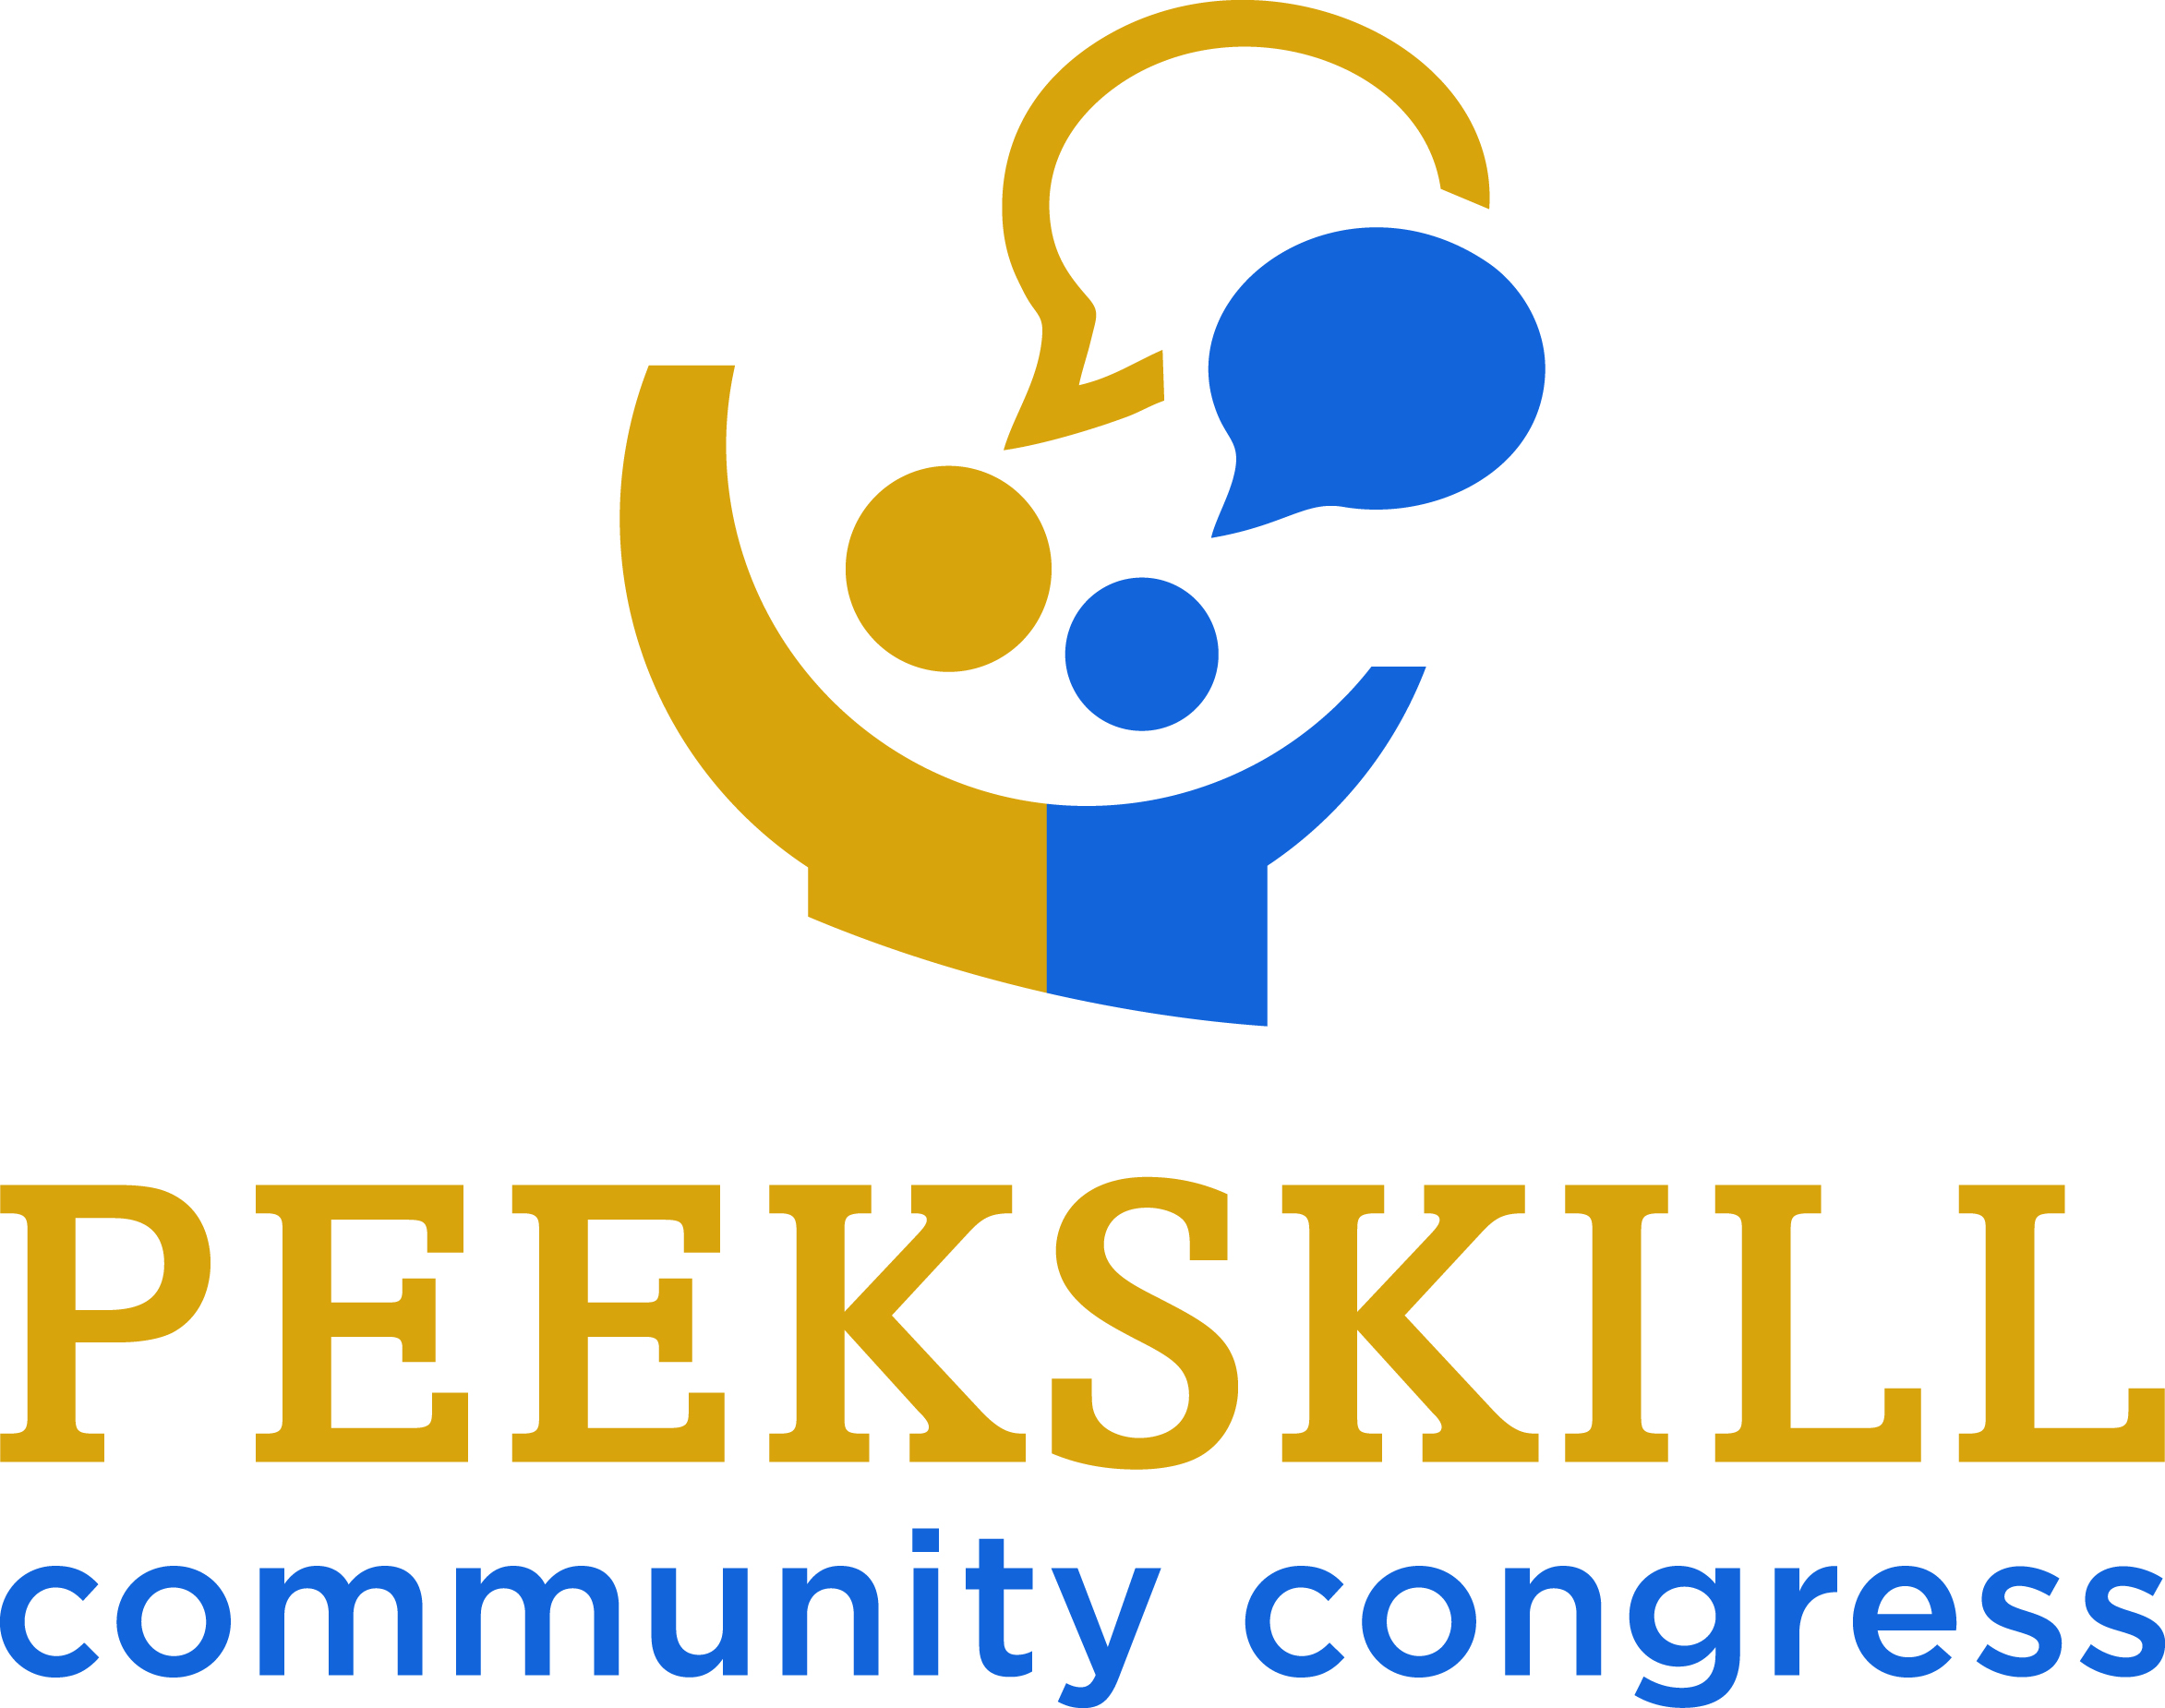 Peekskill Community Congress_Logo.jpg